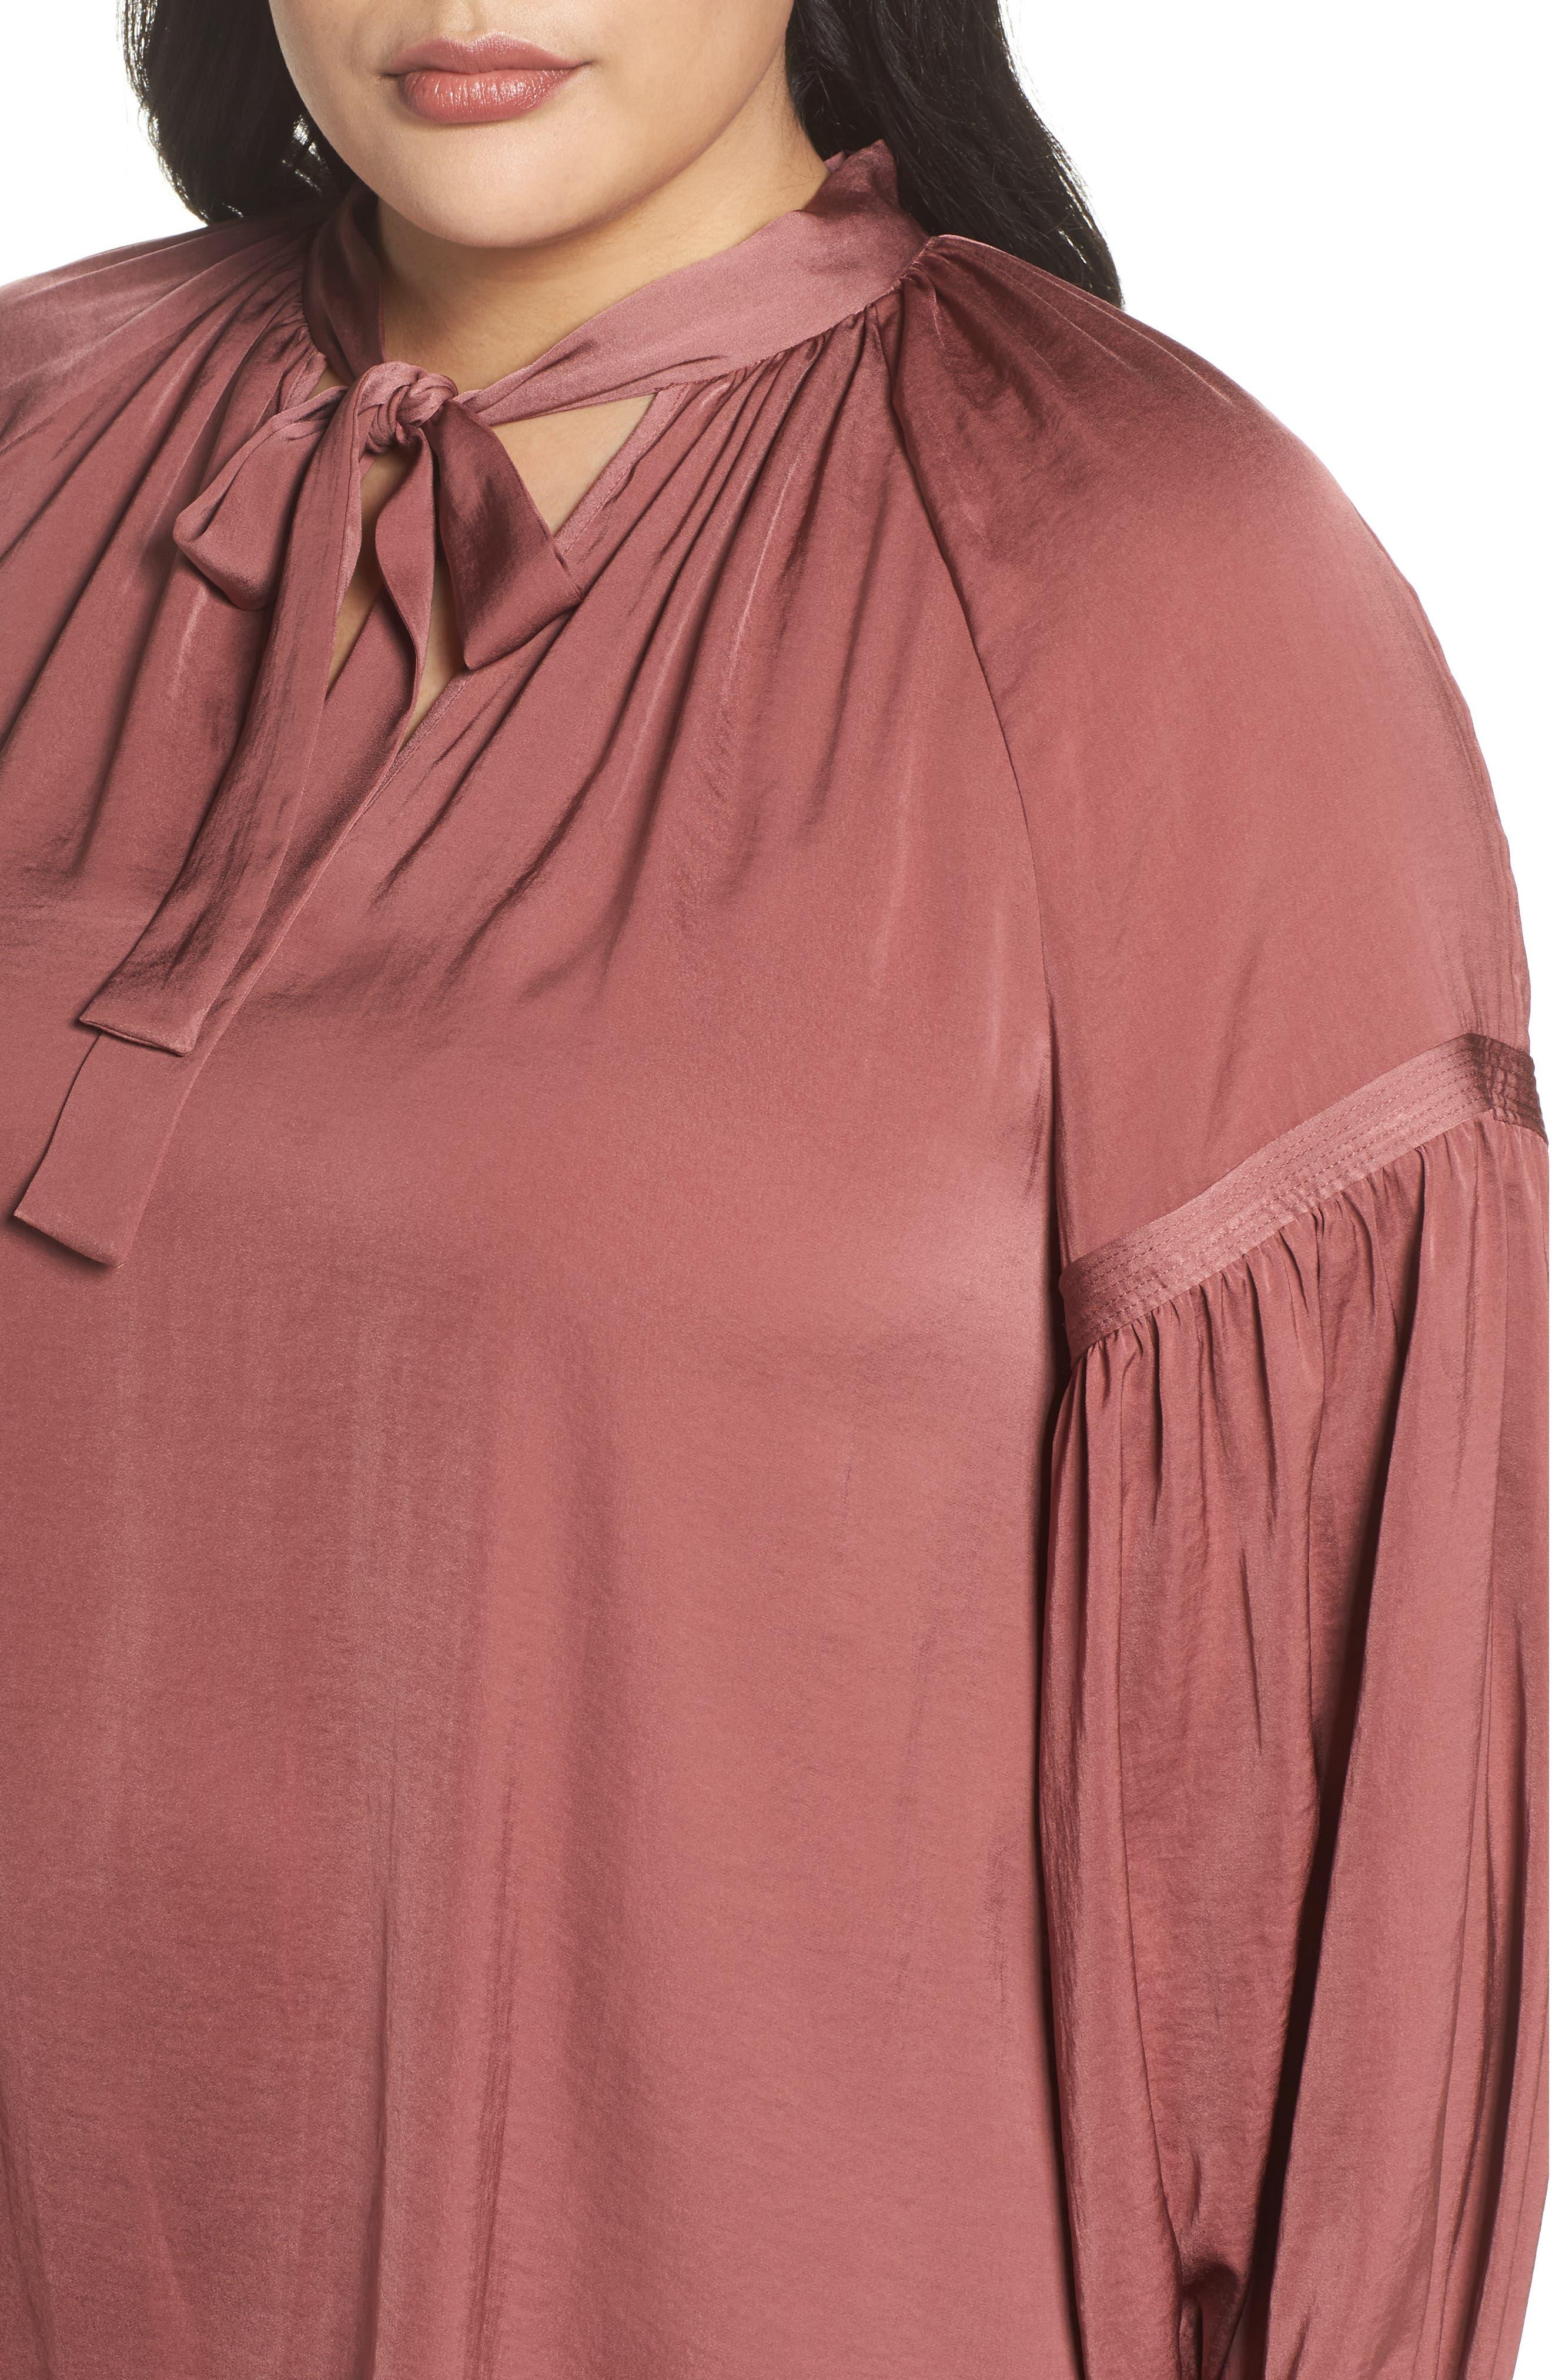 Alternate Image 4  - Lucky Brand Jenna Peasant Top (Plus Size)